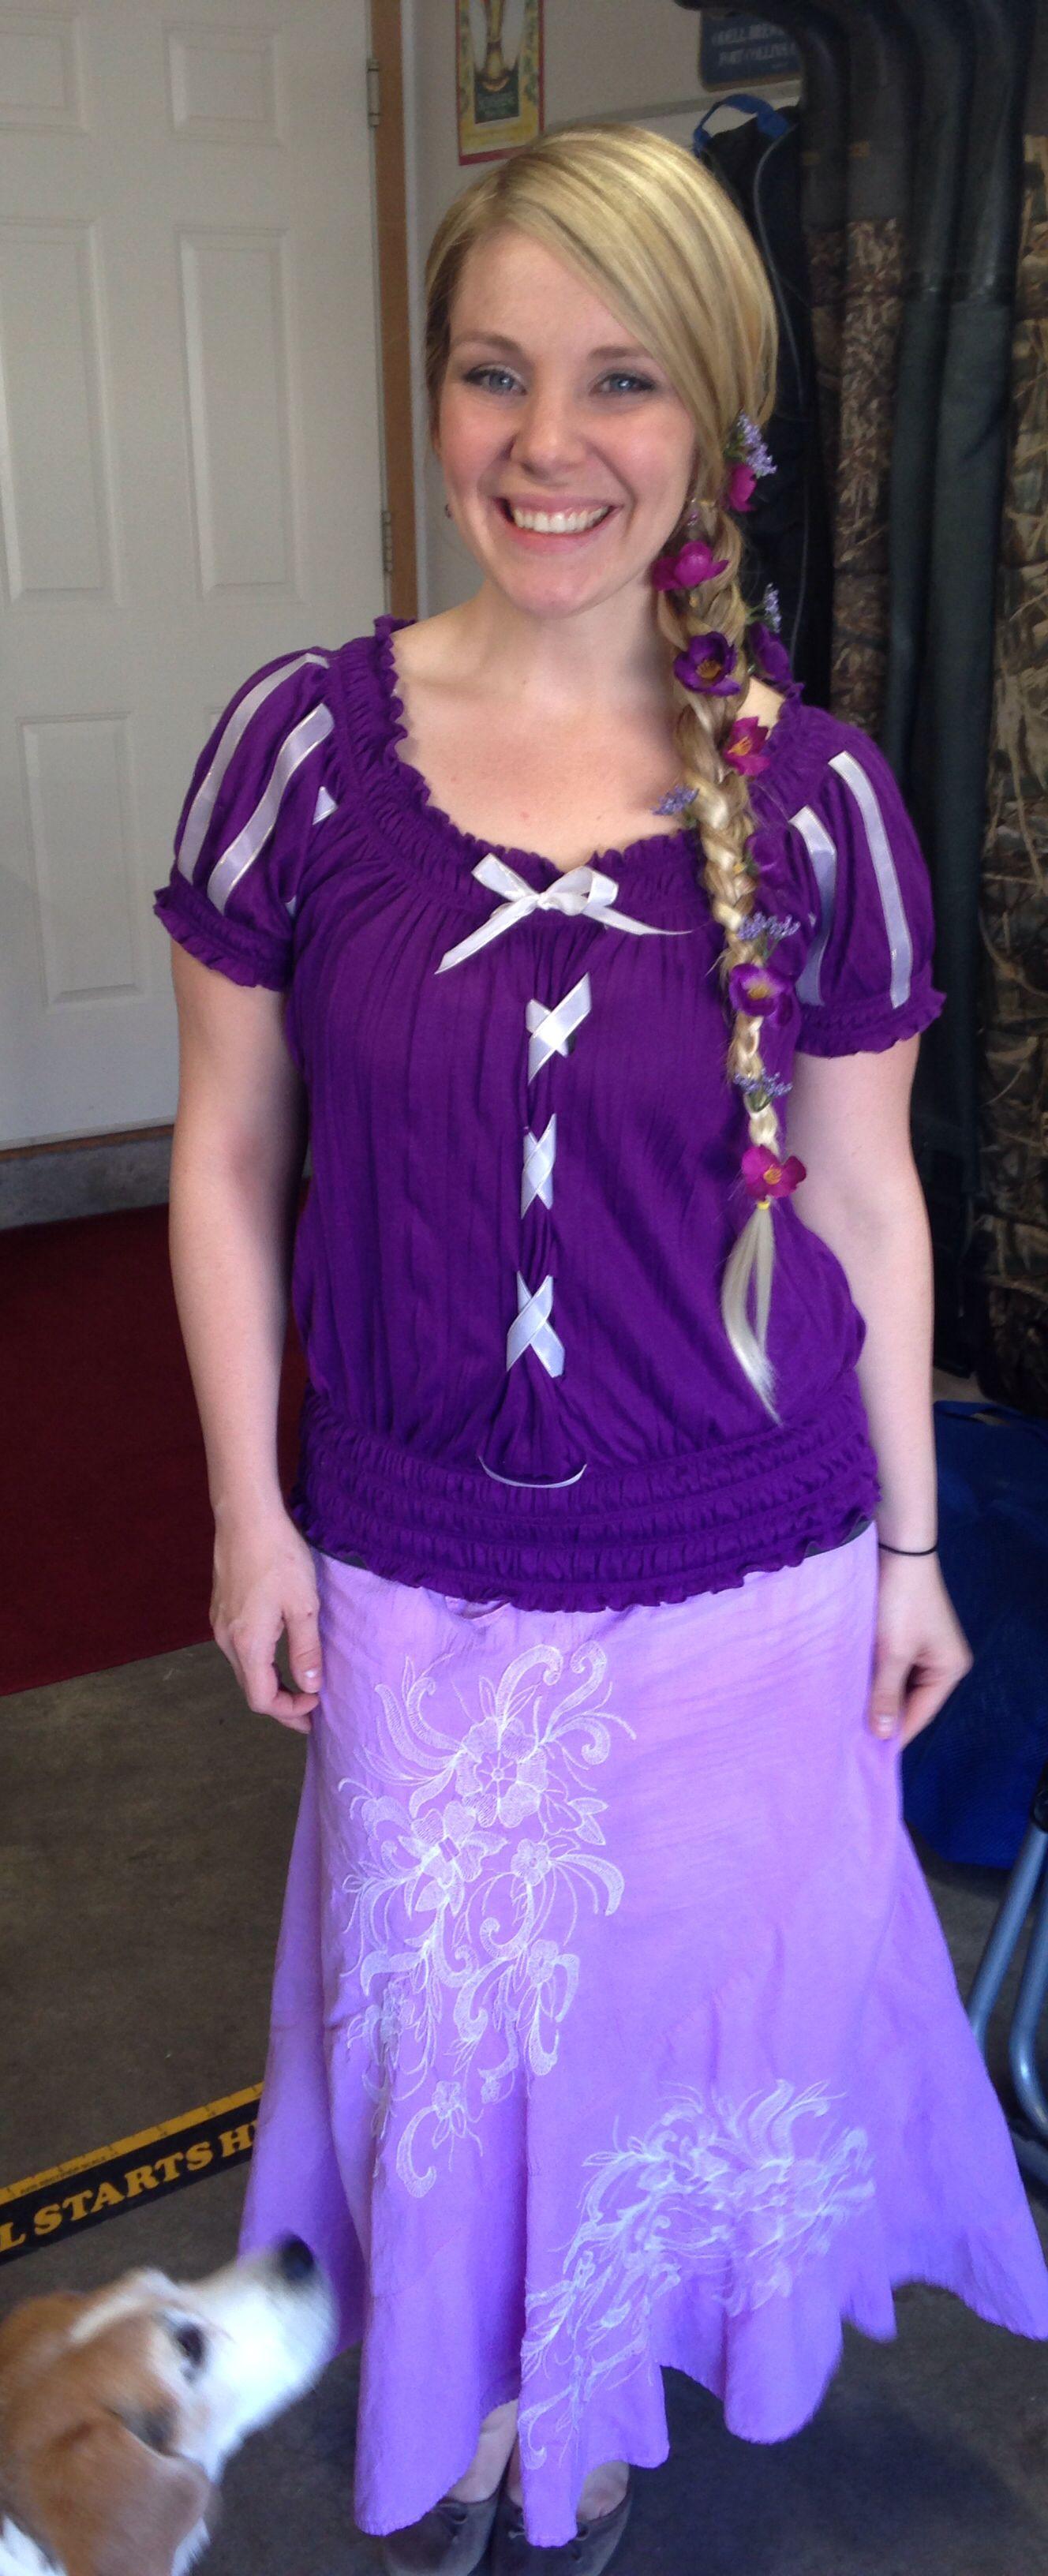 Diy adult rapunzel costume tangled my pins pinterest diy adult rapunzel costume tangled solutioingenieria Images